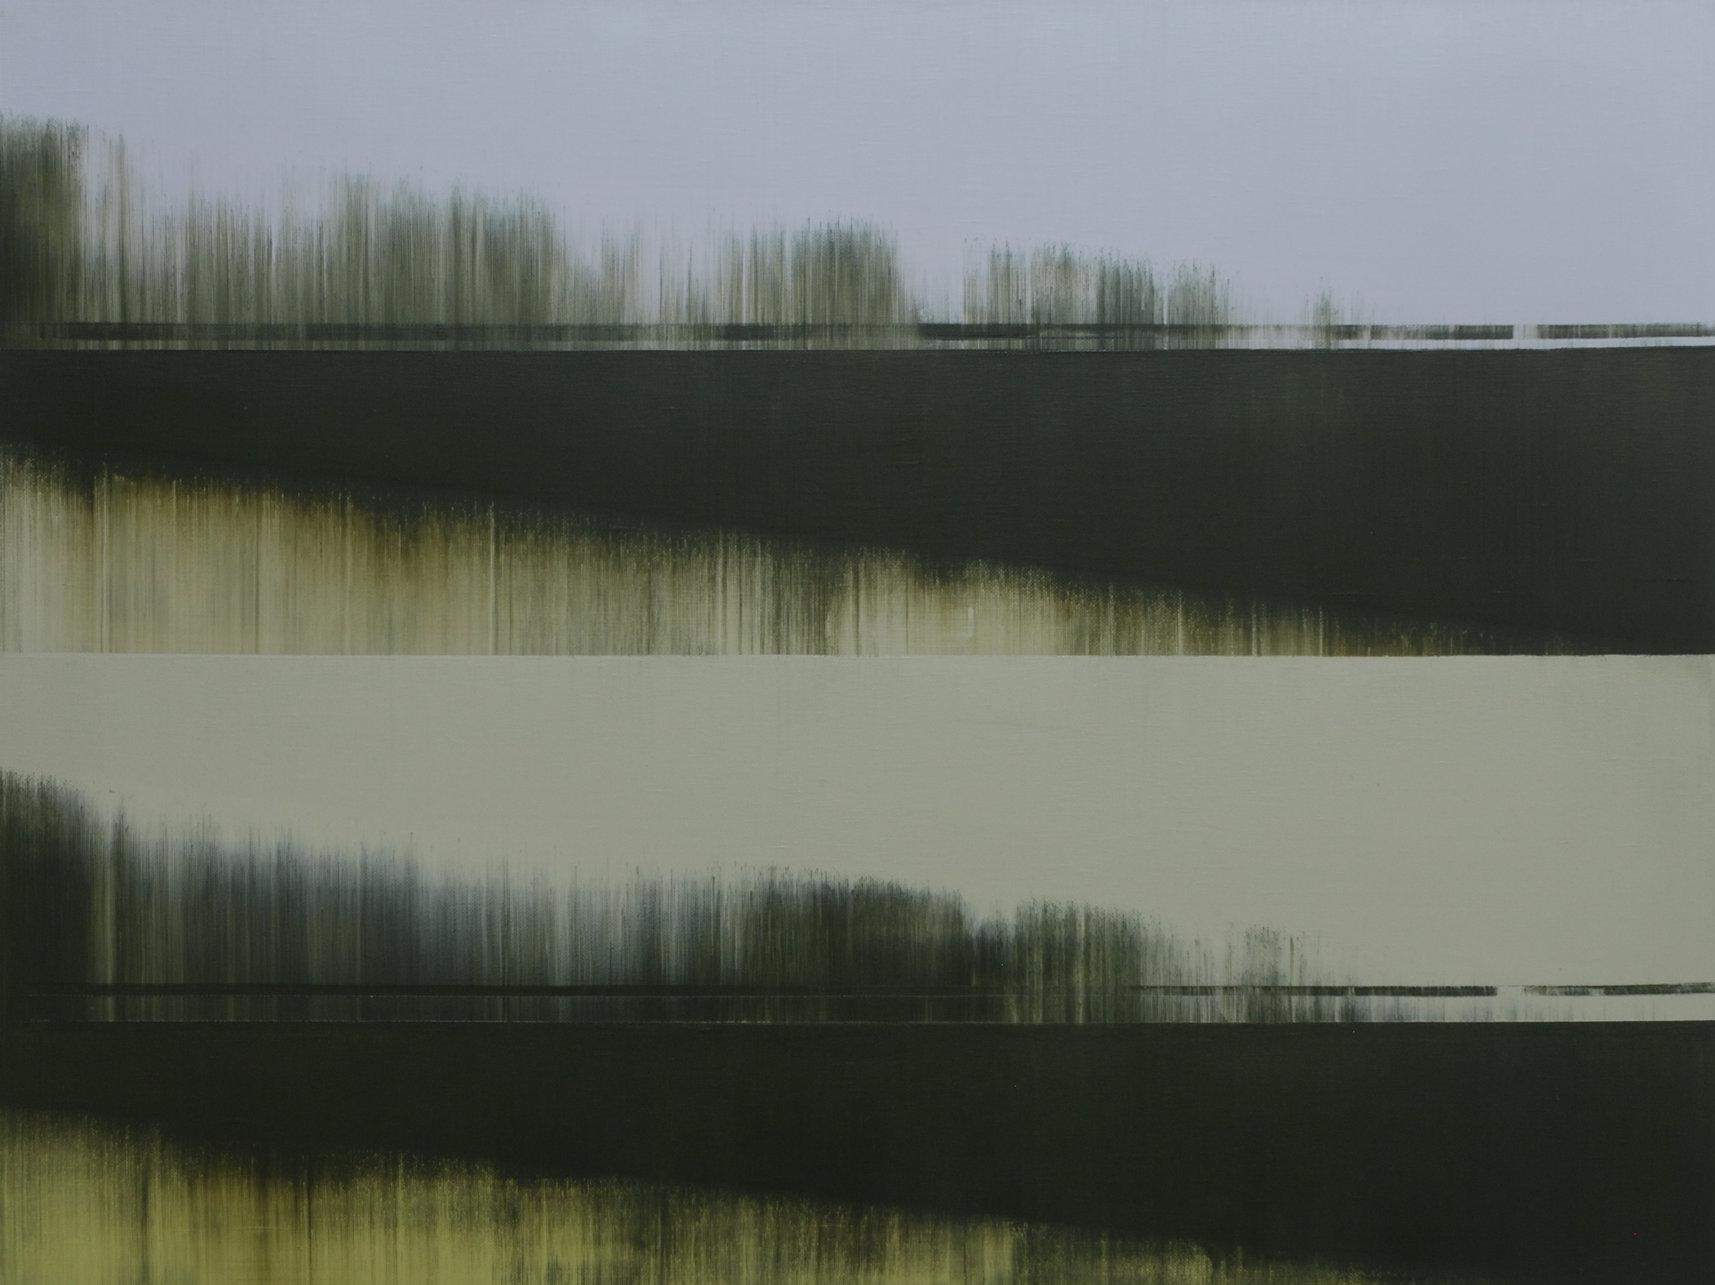 Parallel Terrain iv  |  80cm x 60cm Oil on Canvas